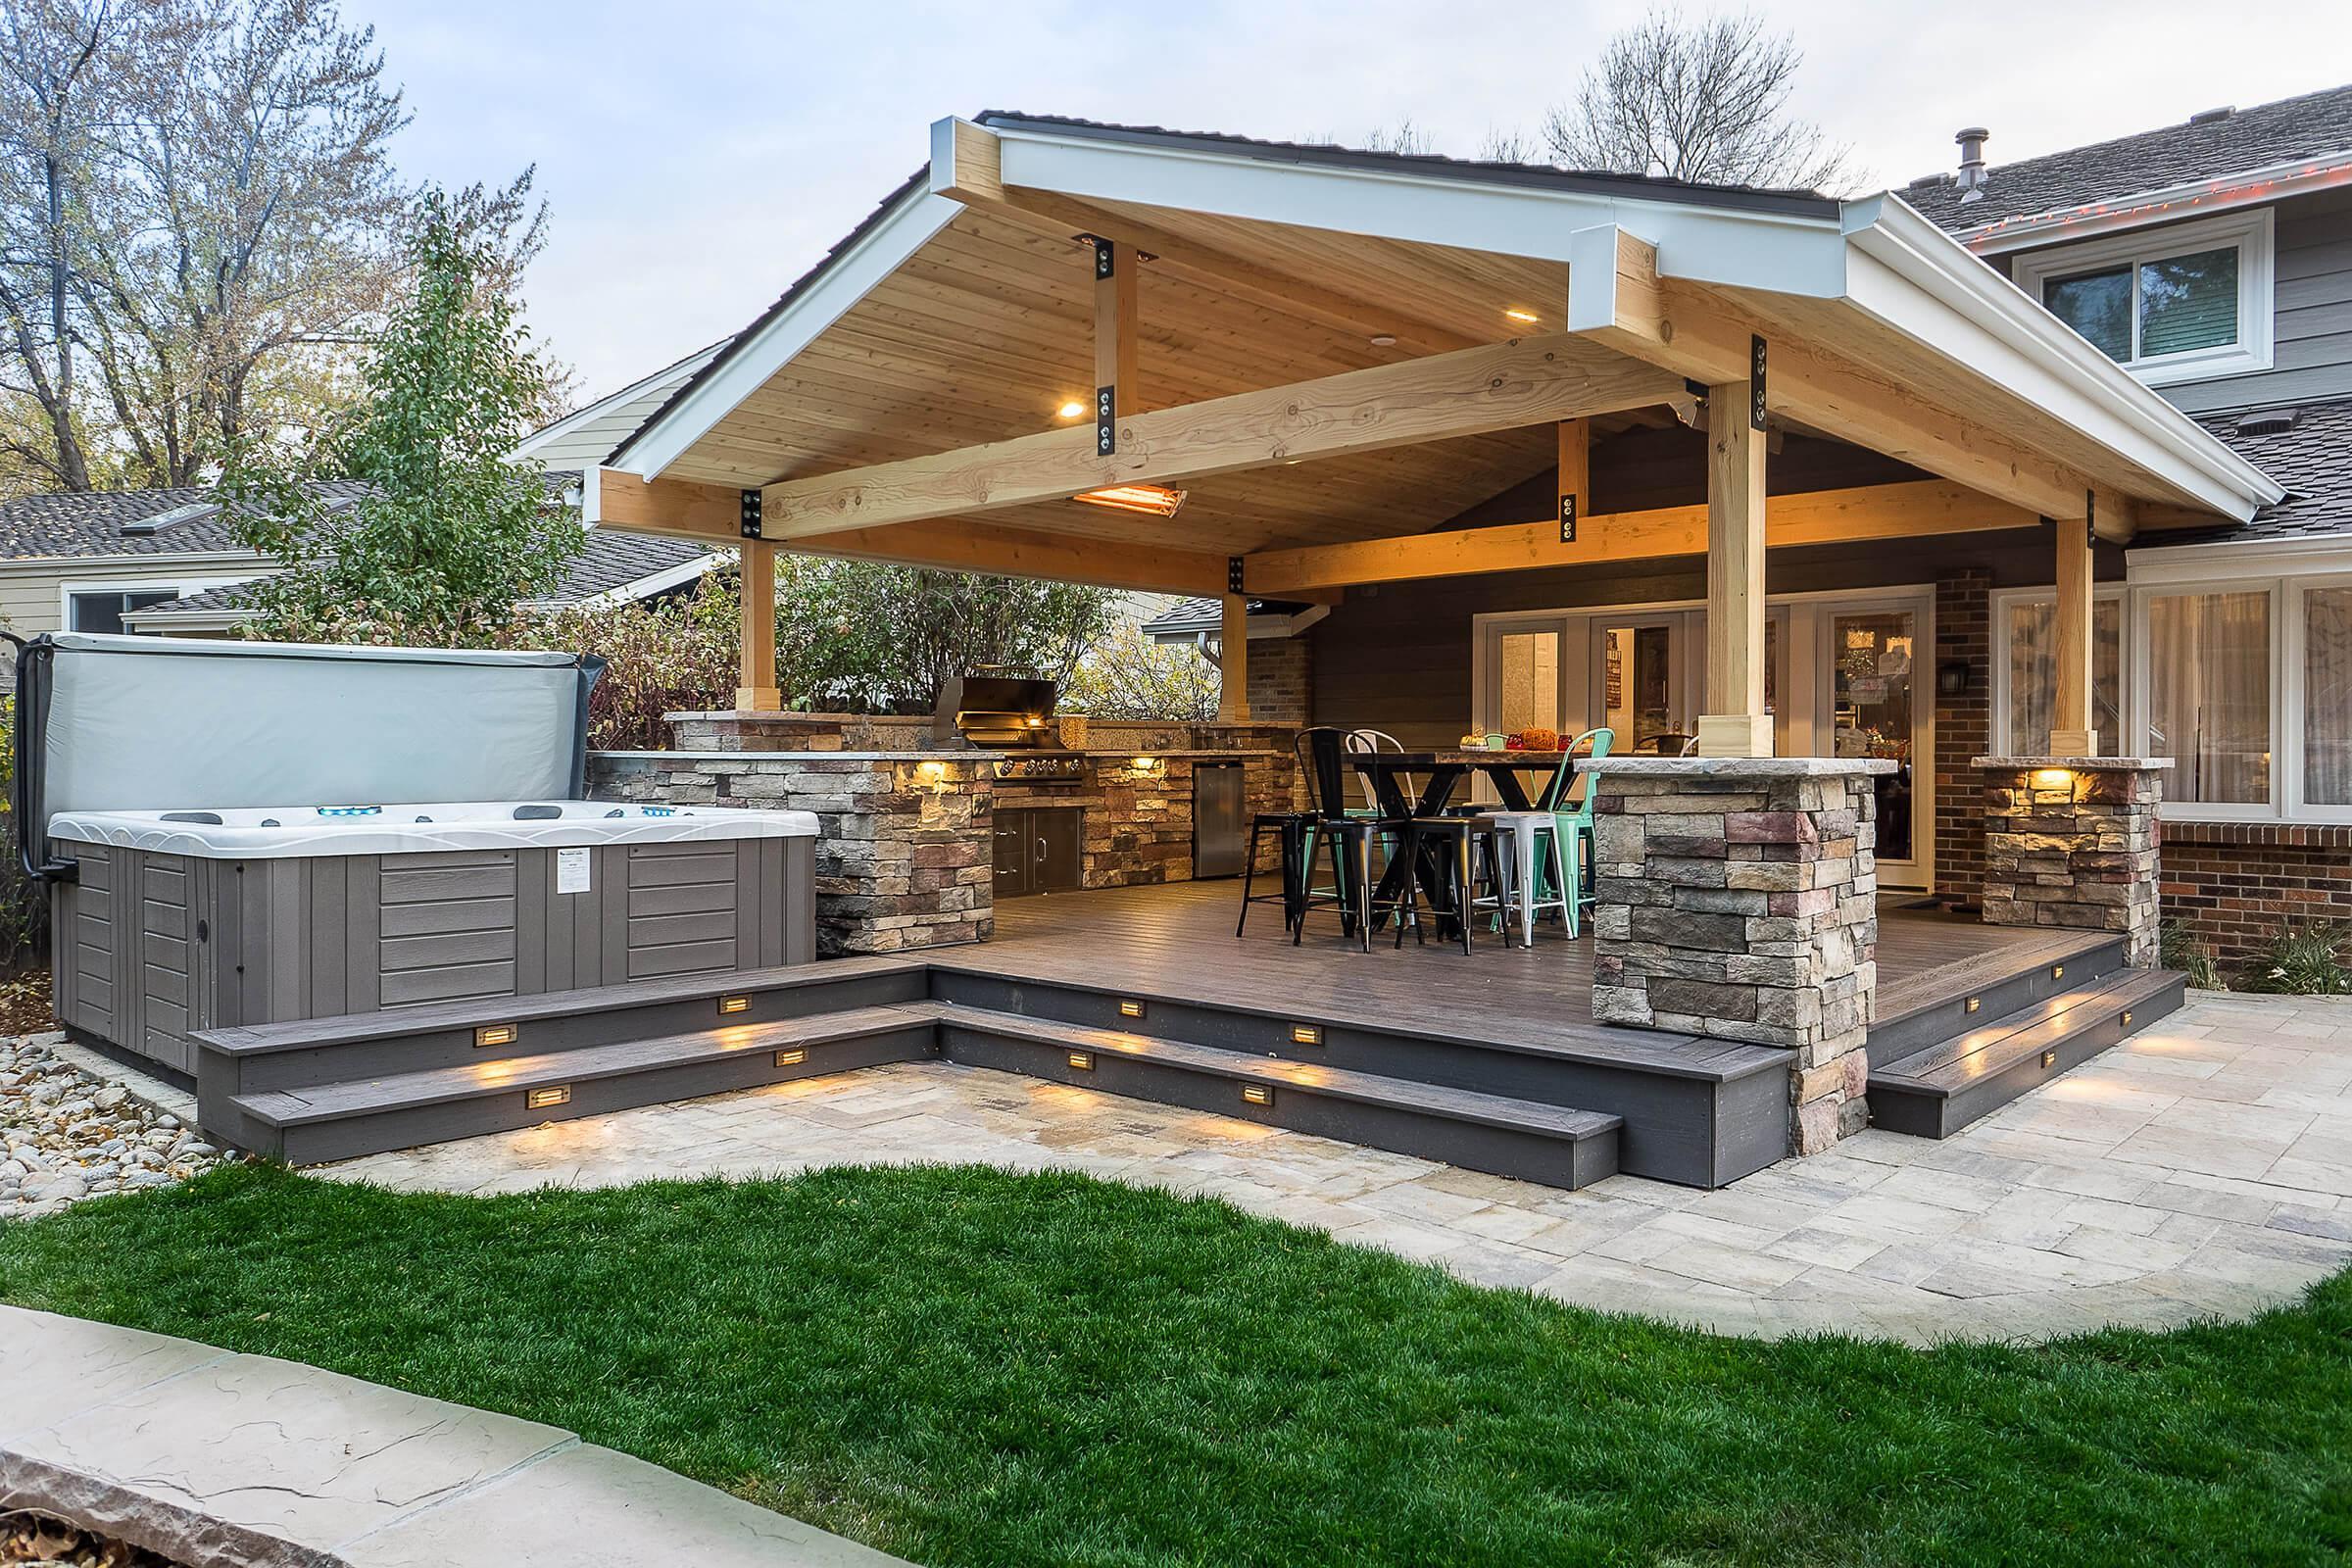 Elite Landscape & Outdoor Living - Denver, Colorado ... on Elite Landscape And Outdoor Living id=58931